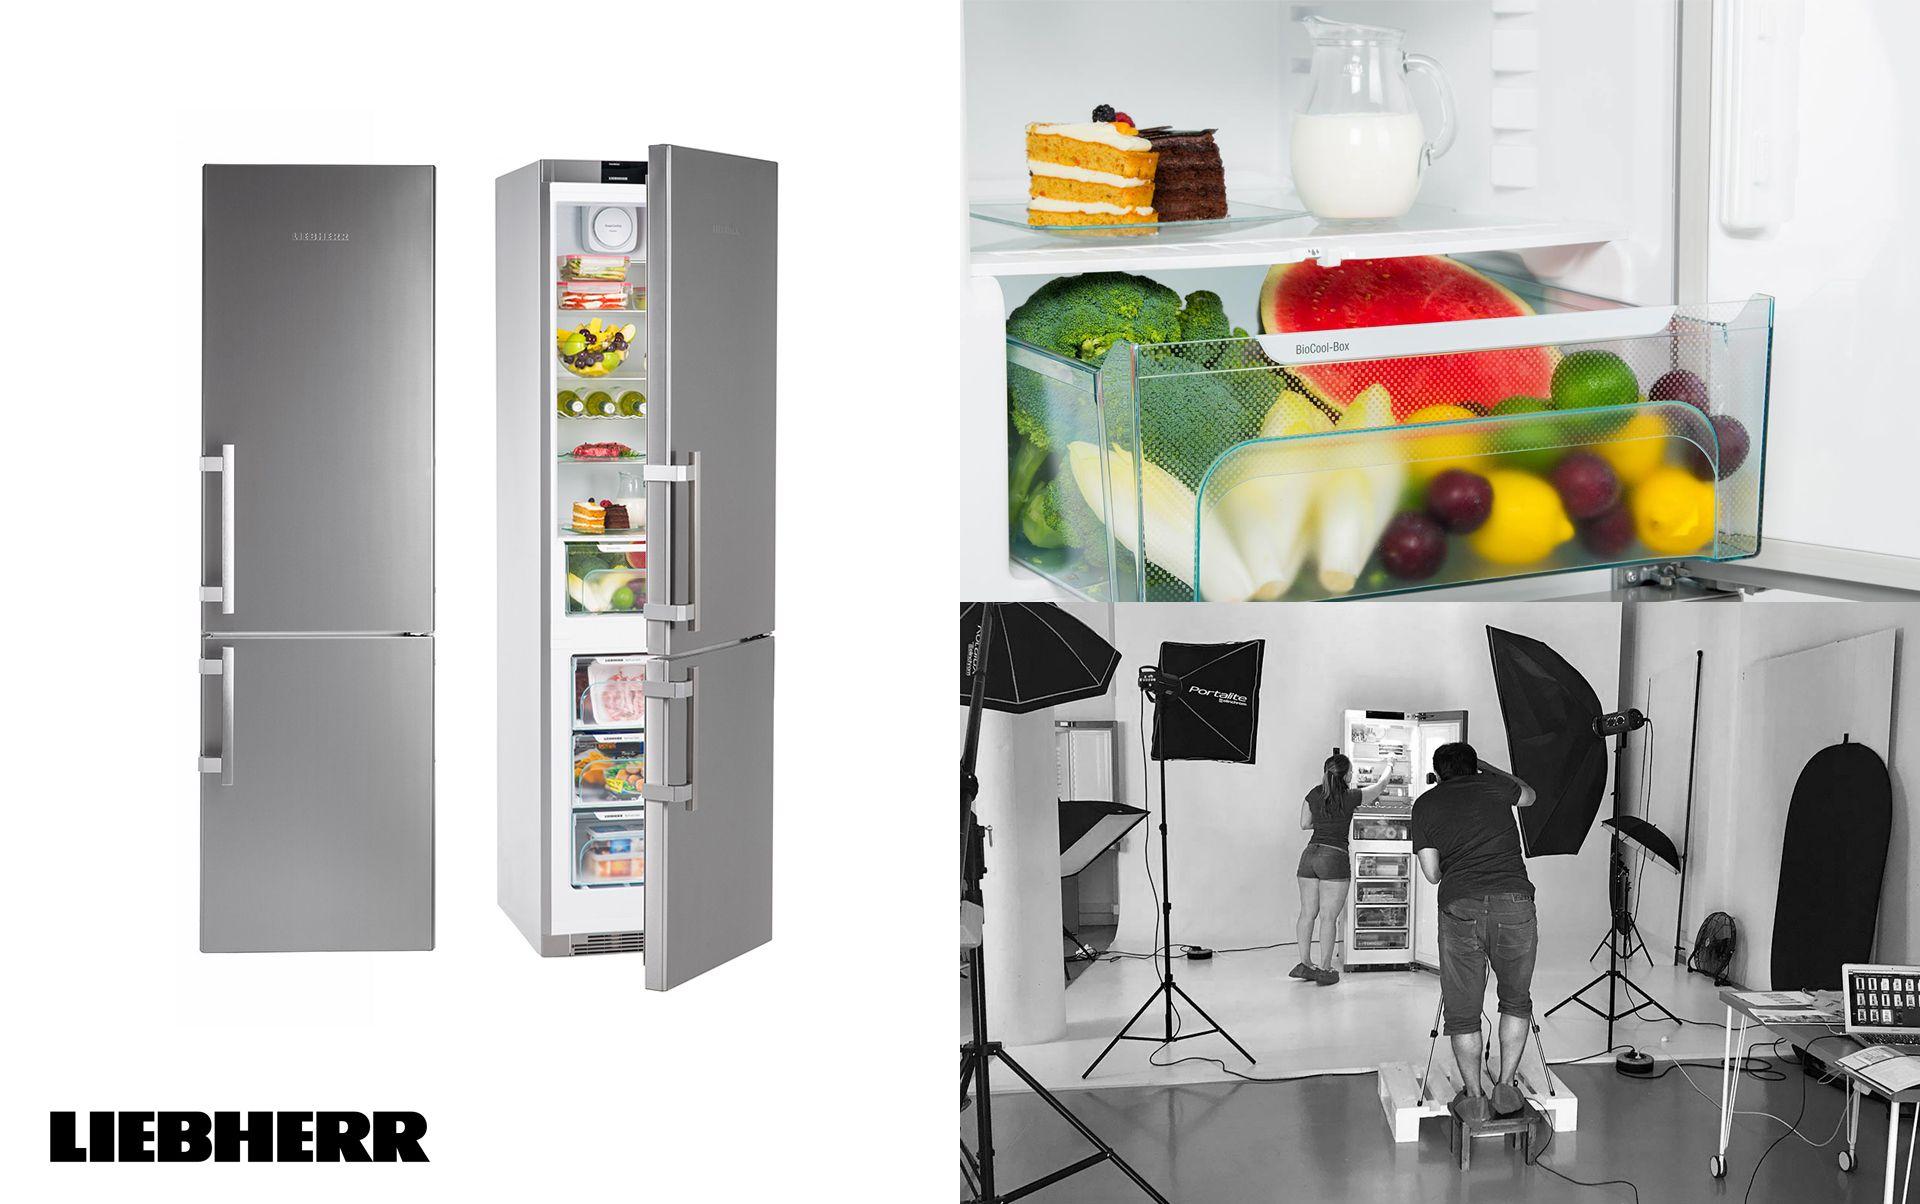 Liebherr sesion fotografica neveras - Sesión fotográfica de electrodomésticos